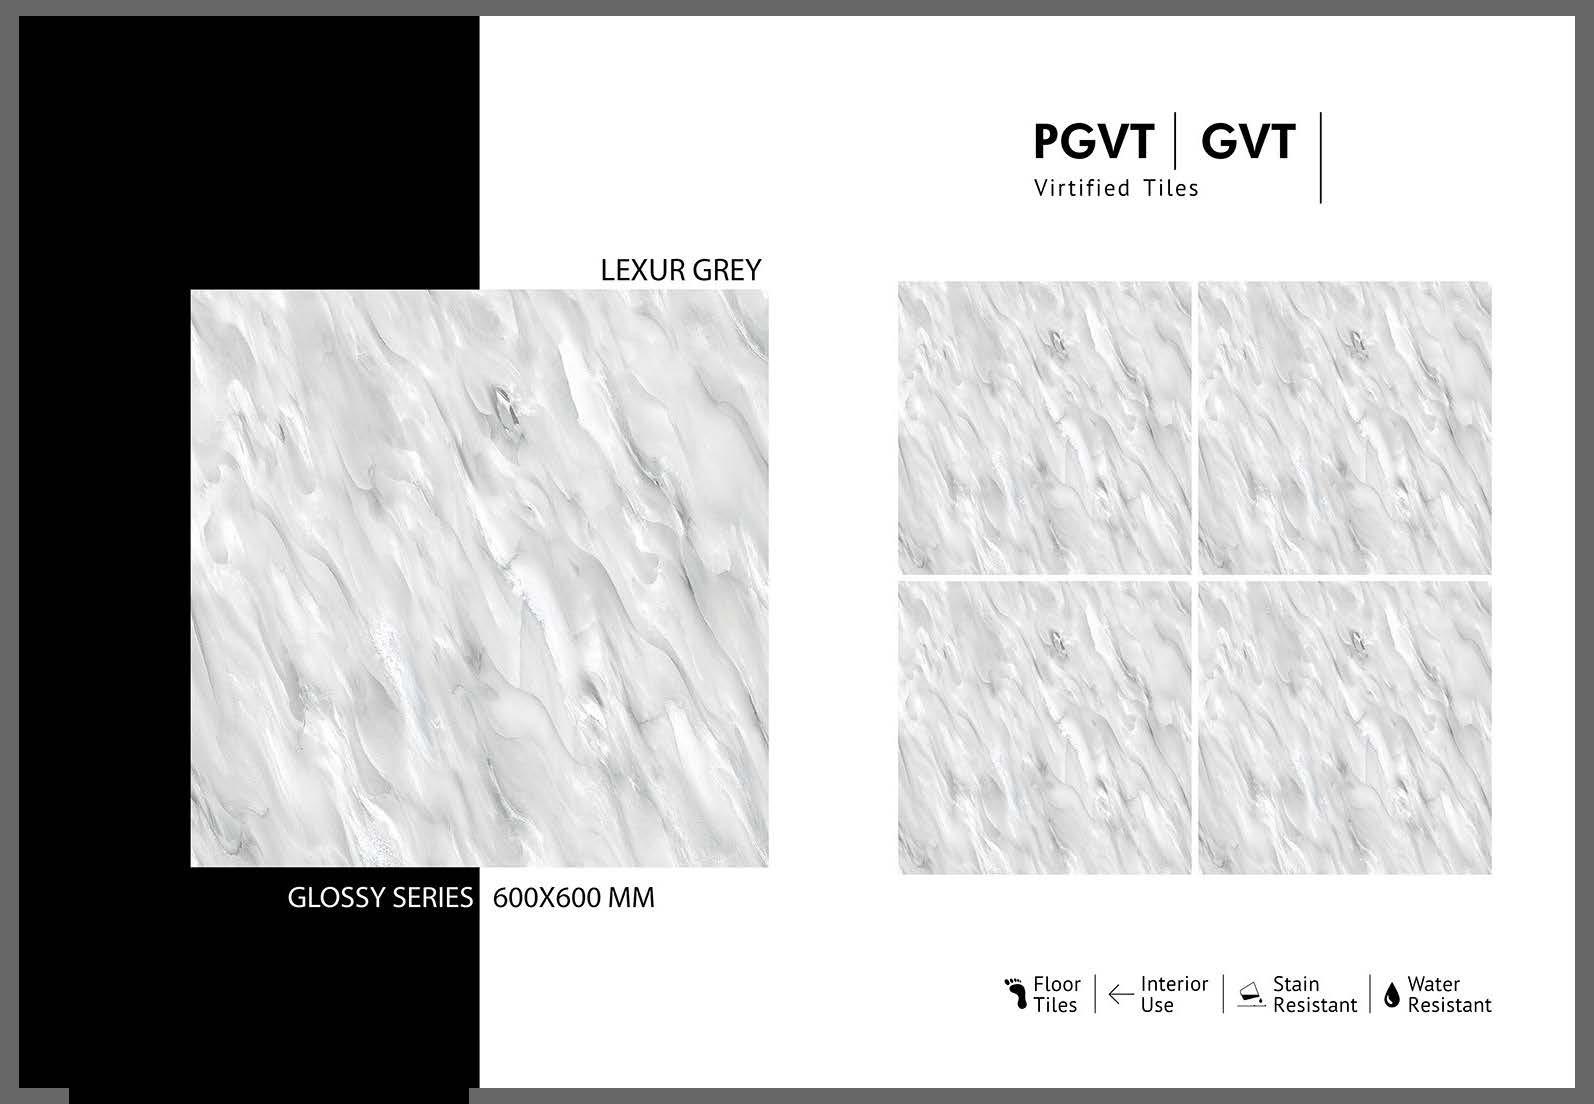 GVT 2X2 GLOSSY_Page_79.jpg